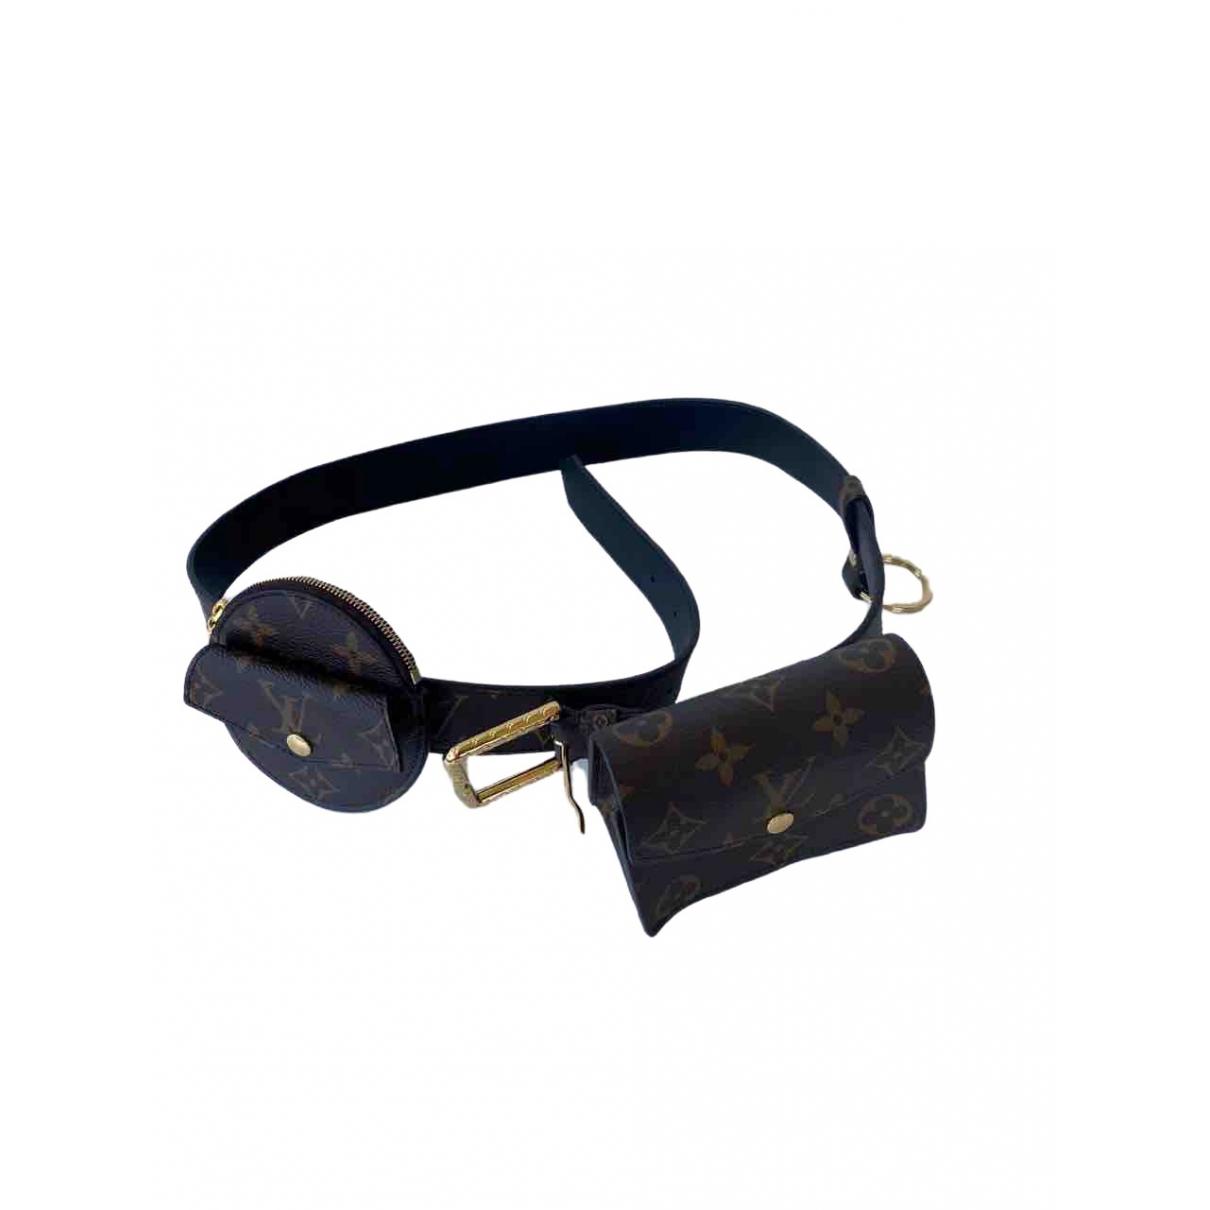 Louis Vuitton Daily multi pocket Brown Cloth belt for Women 95 cm